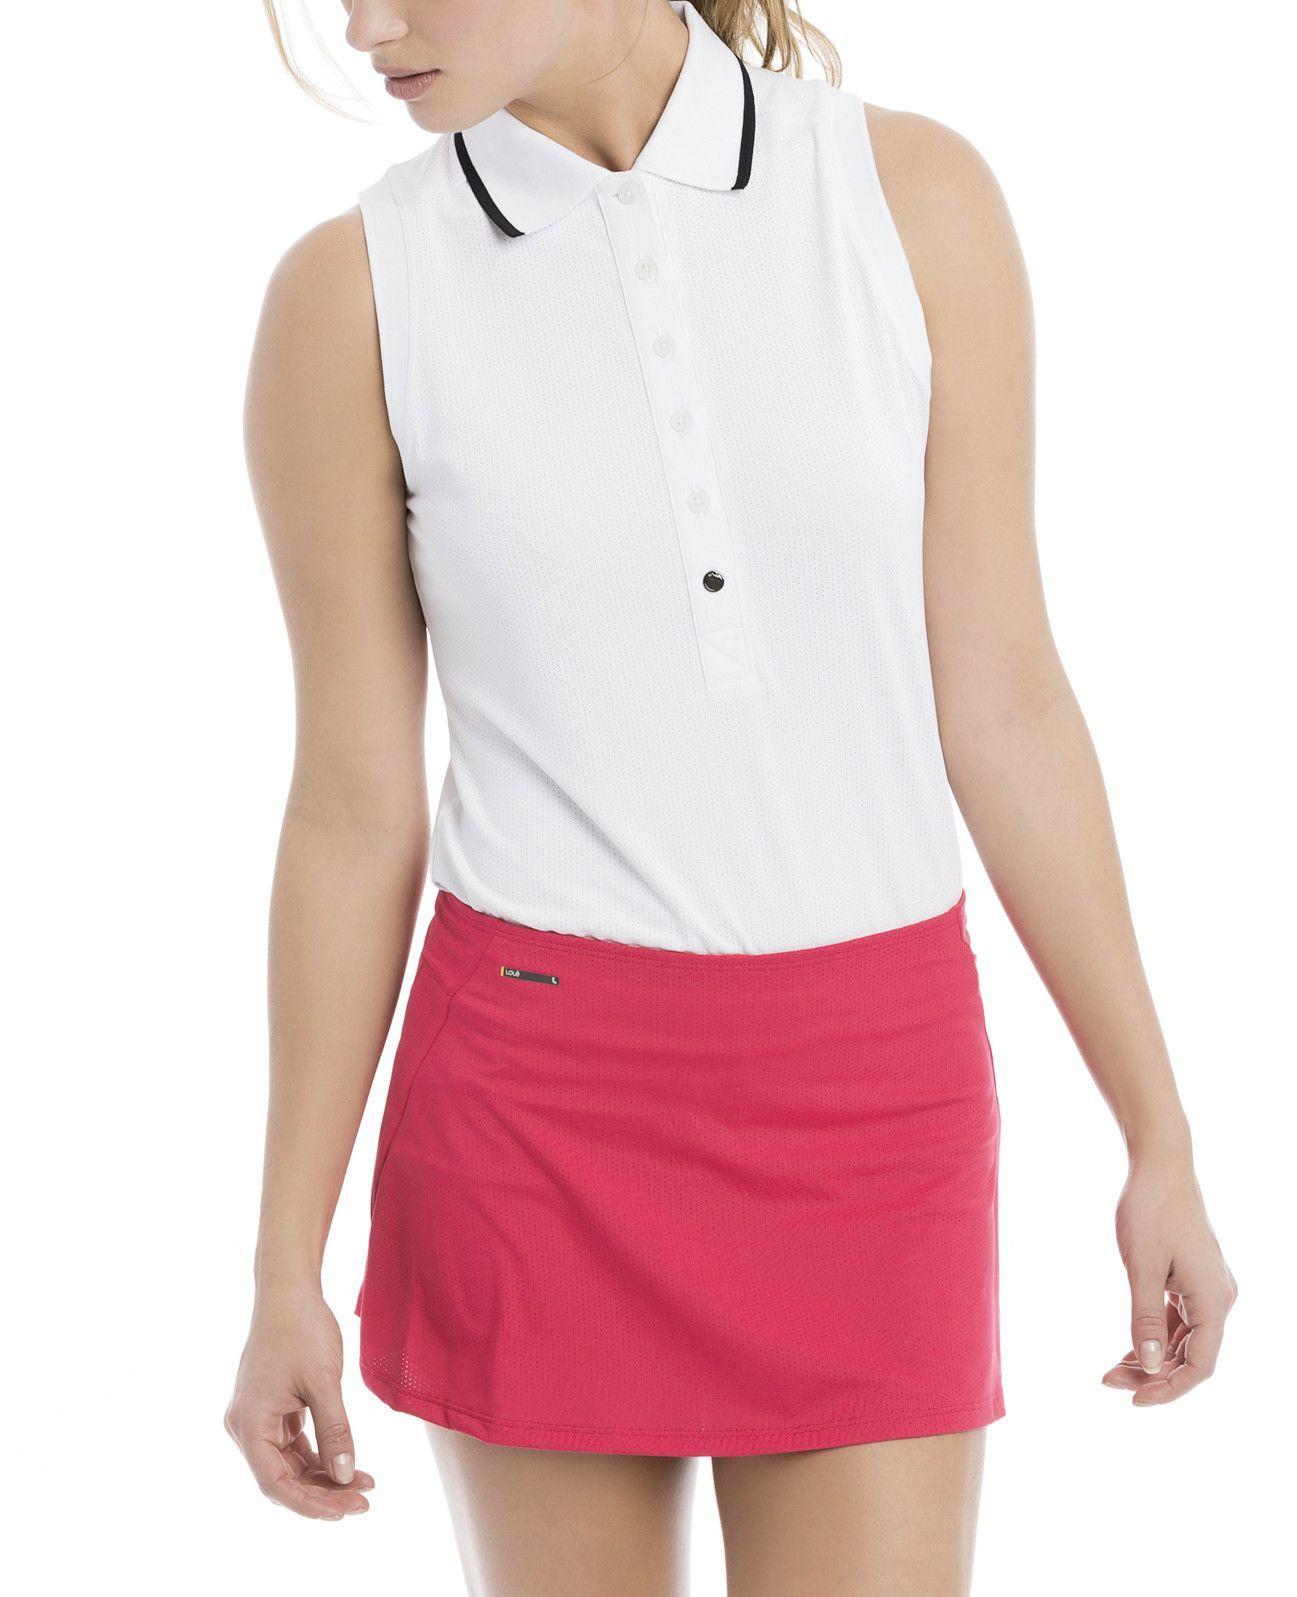 Lole clarisa sleeveless polo shirt outfits pinterest for Plus size sleeveless golf shirts